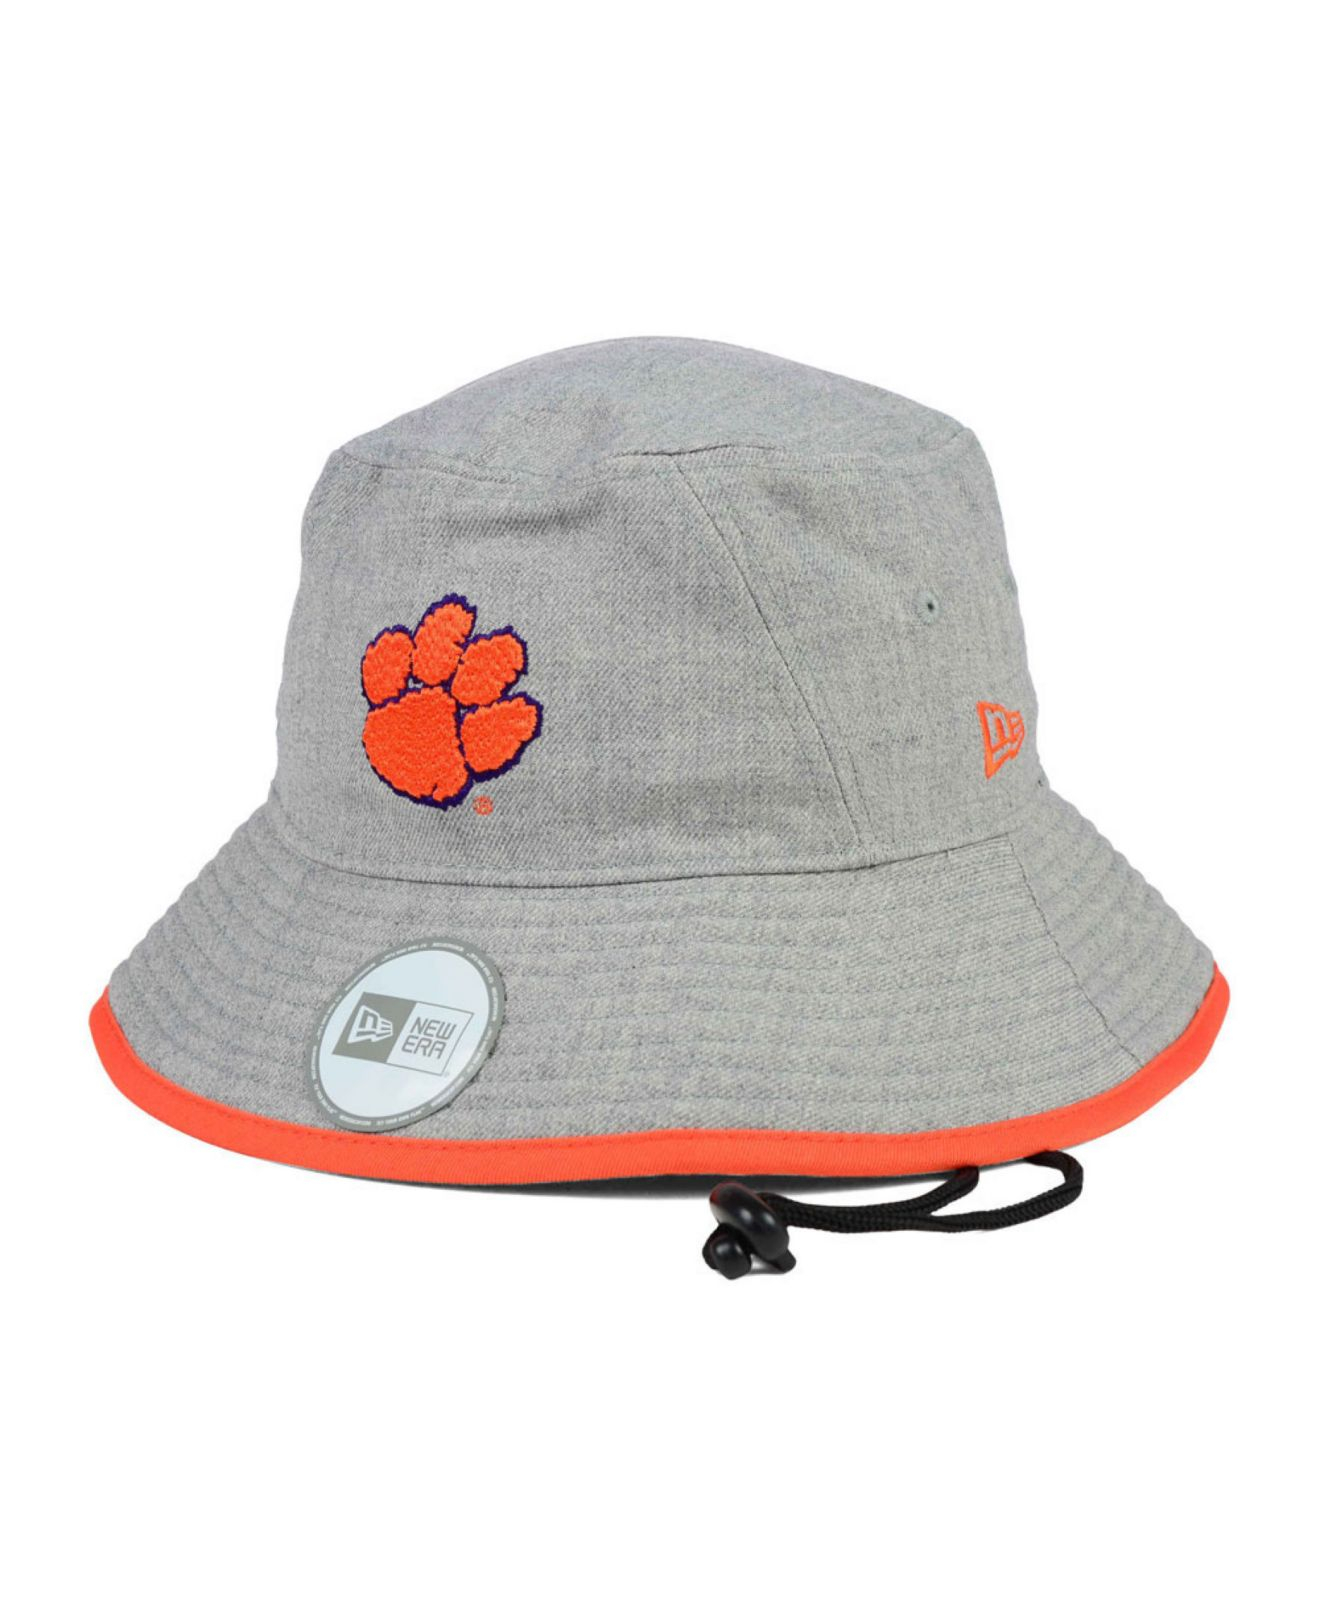 5e37b8f75c9 ... good lyst ktz clemson tigers tip bucket hat in orange for men c29ec  6316d